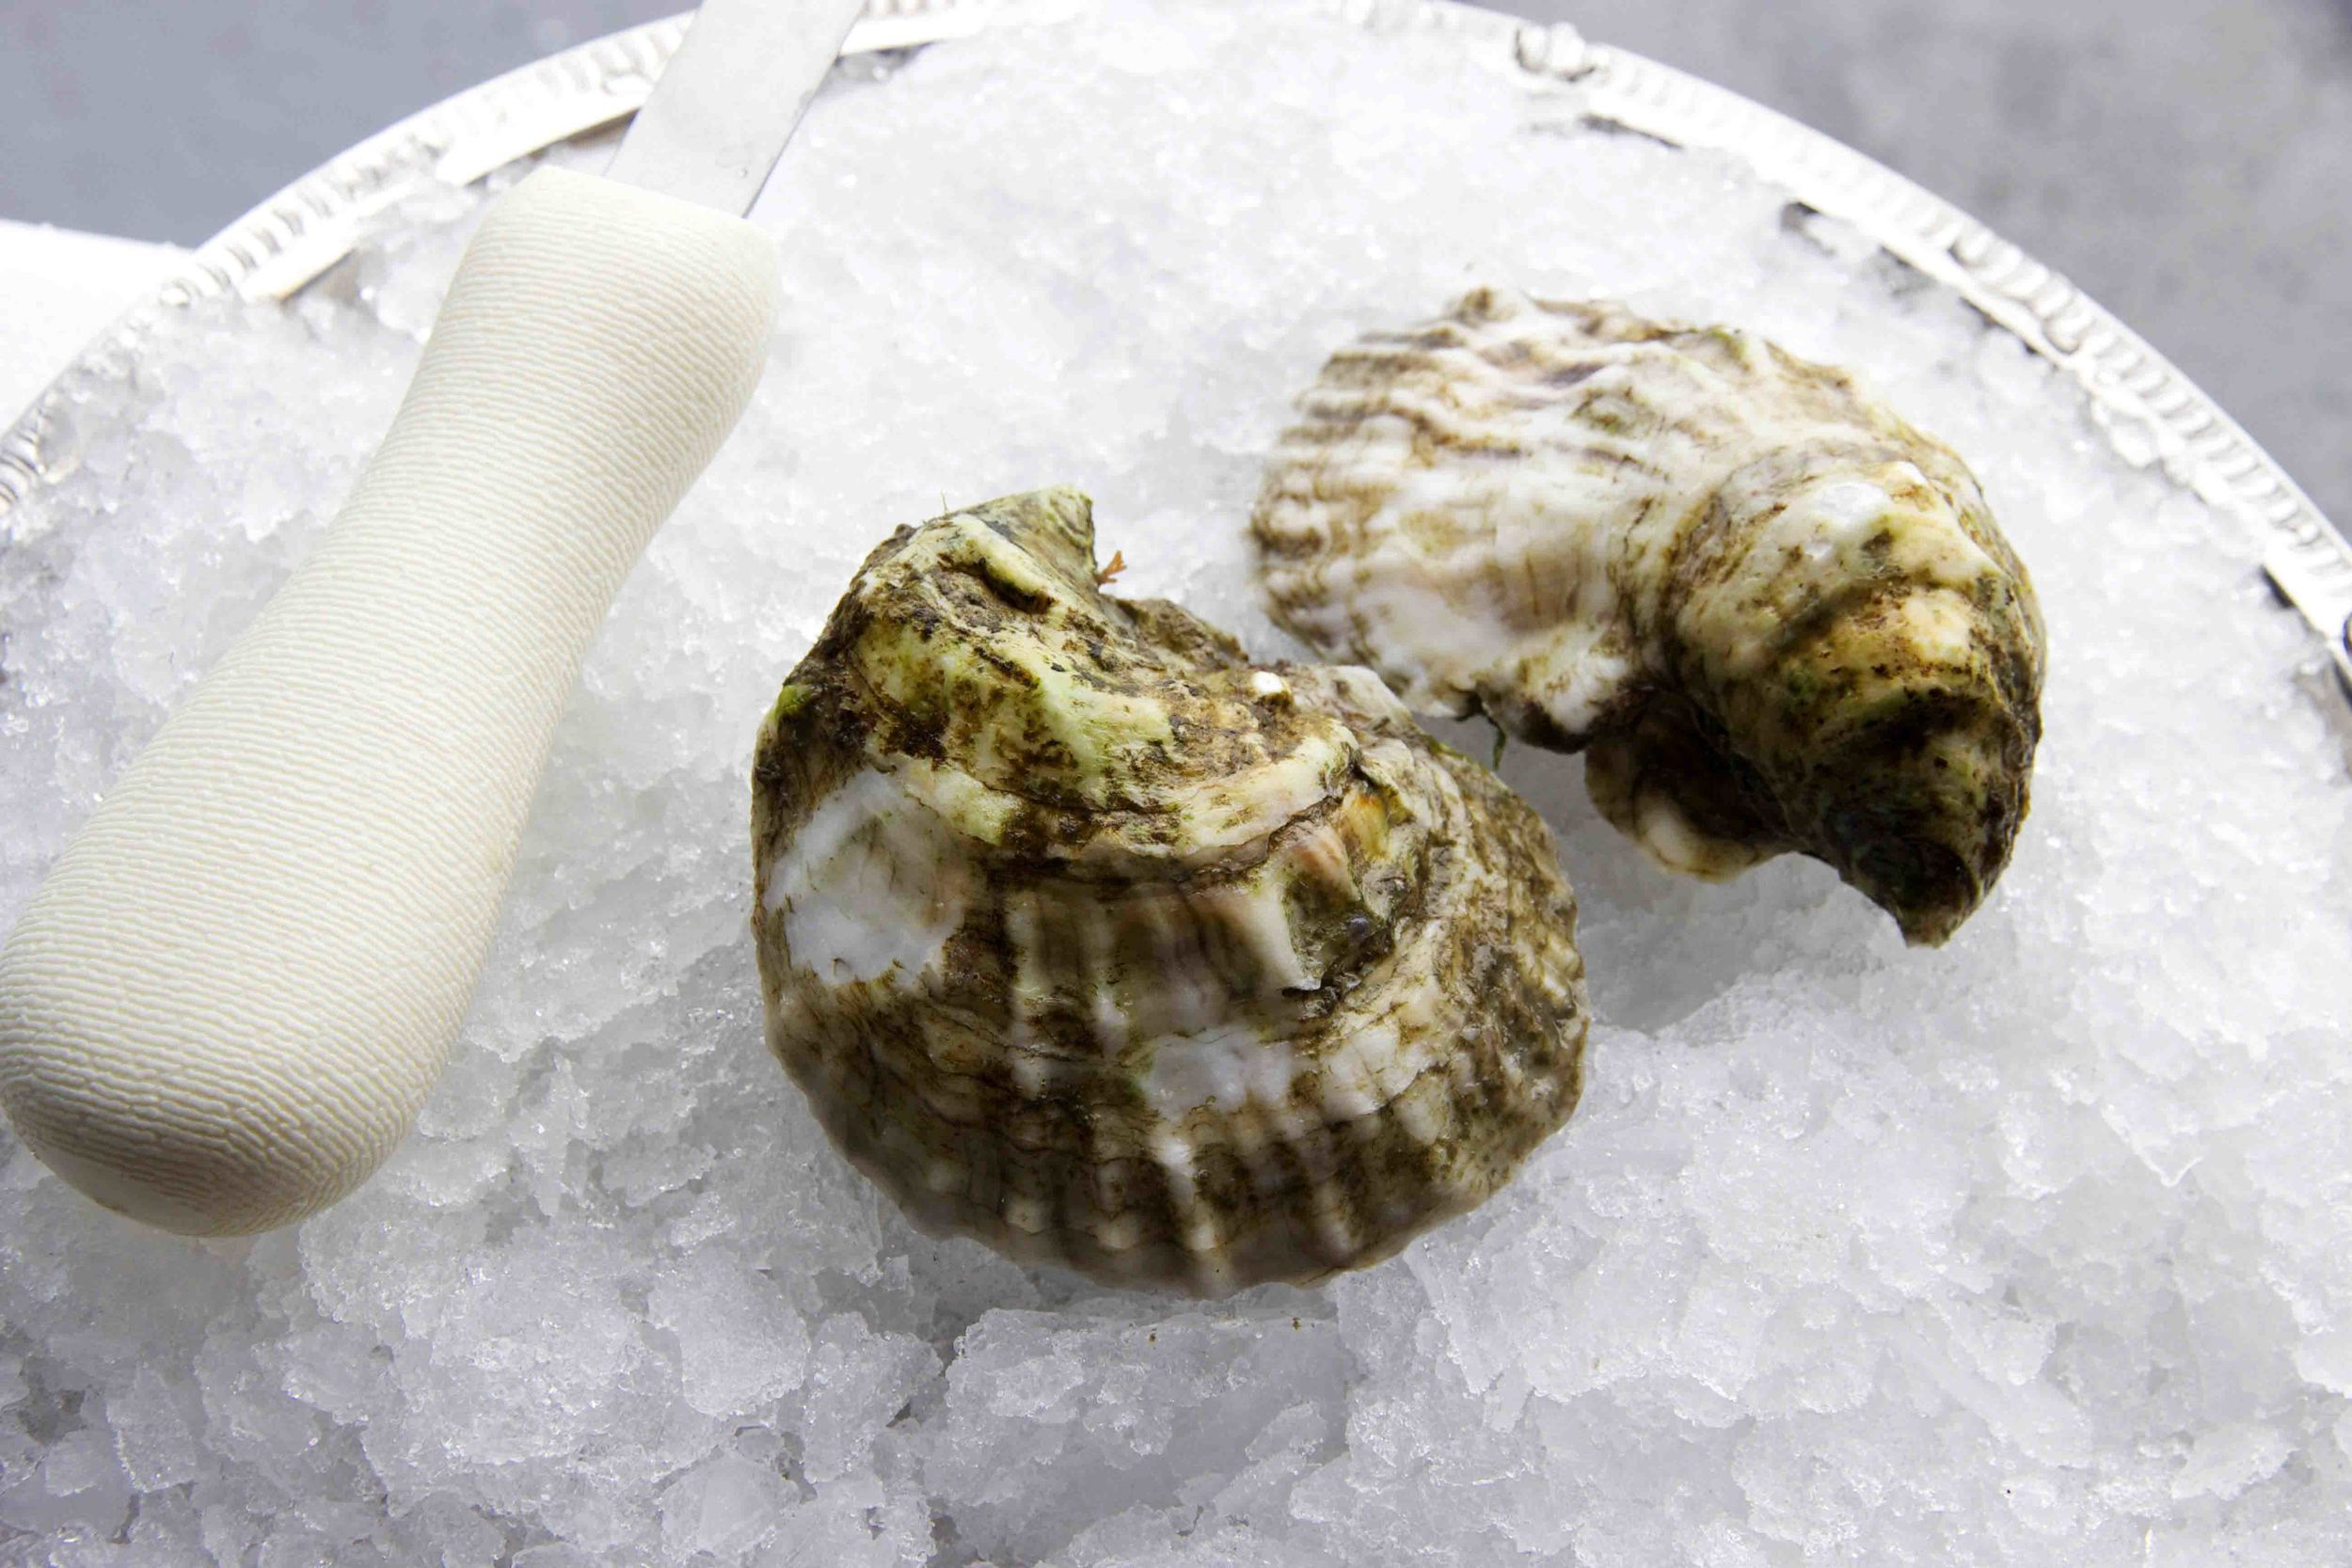 Pangea Shellfish Standish Shore Oyster Shell 2 LR.jpg